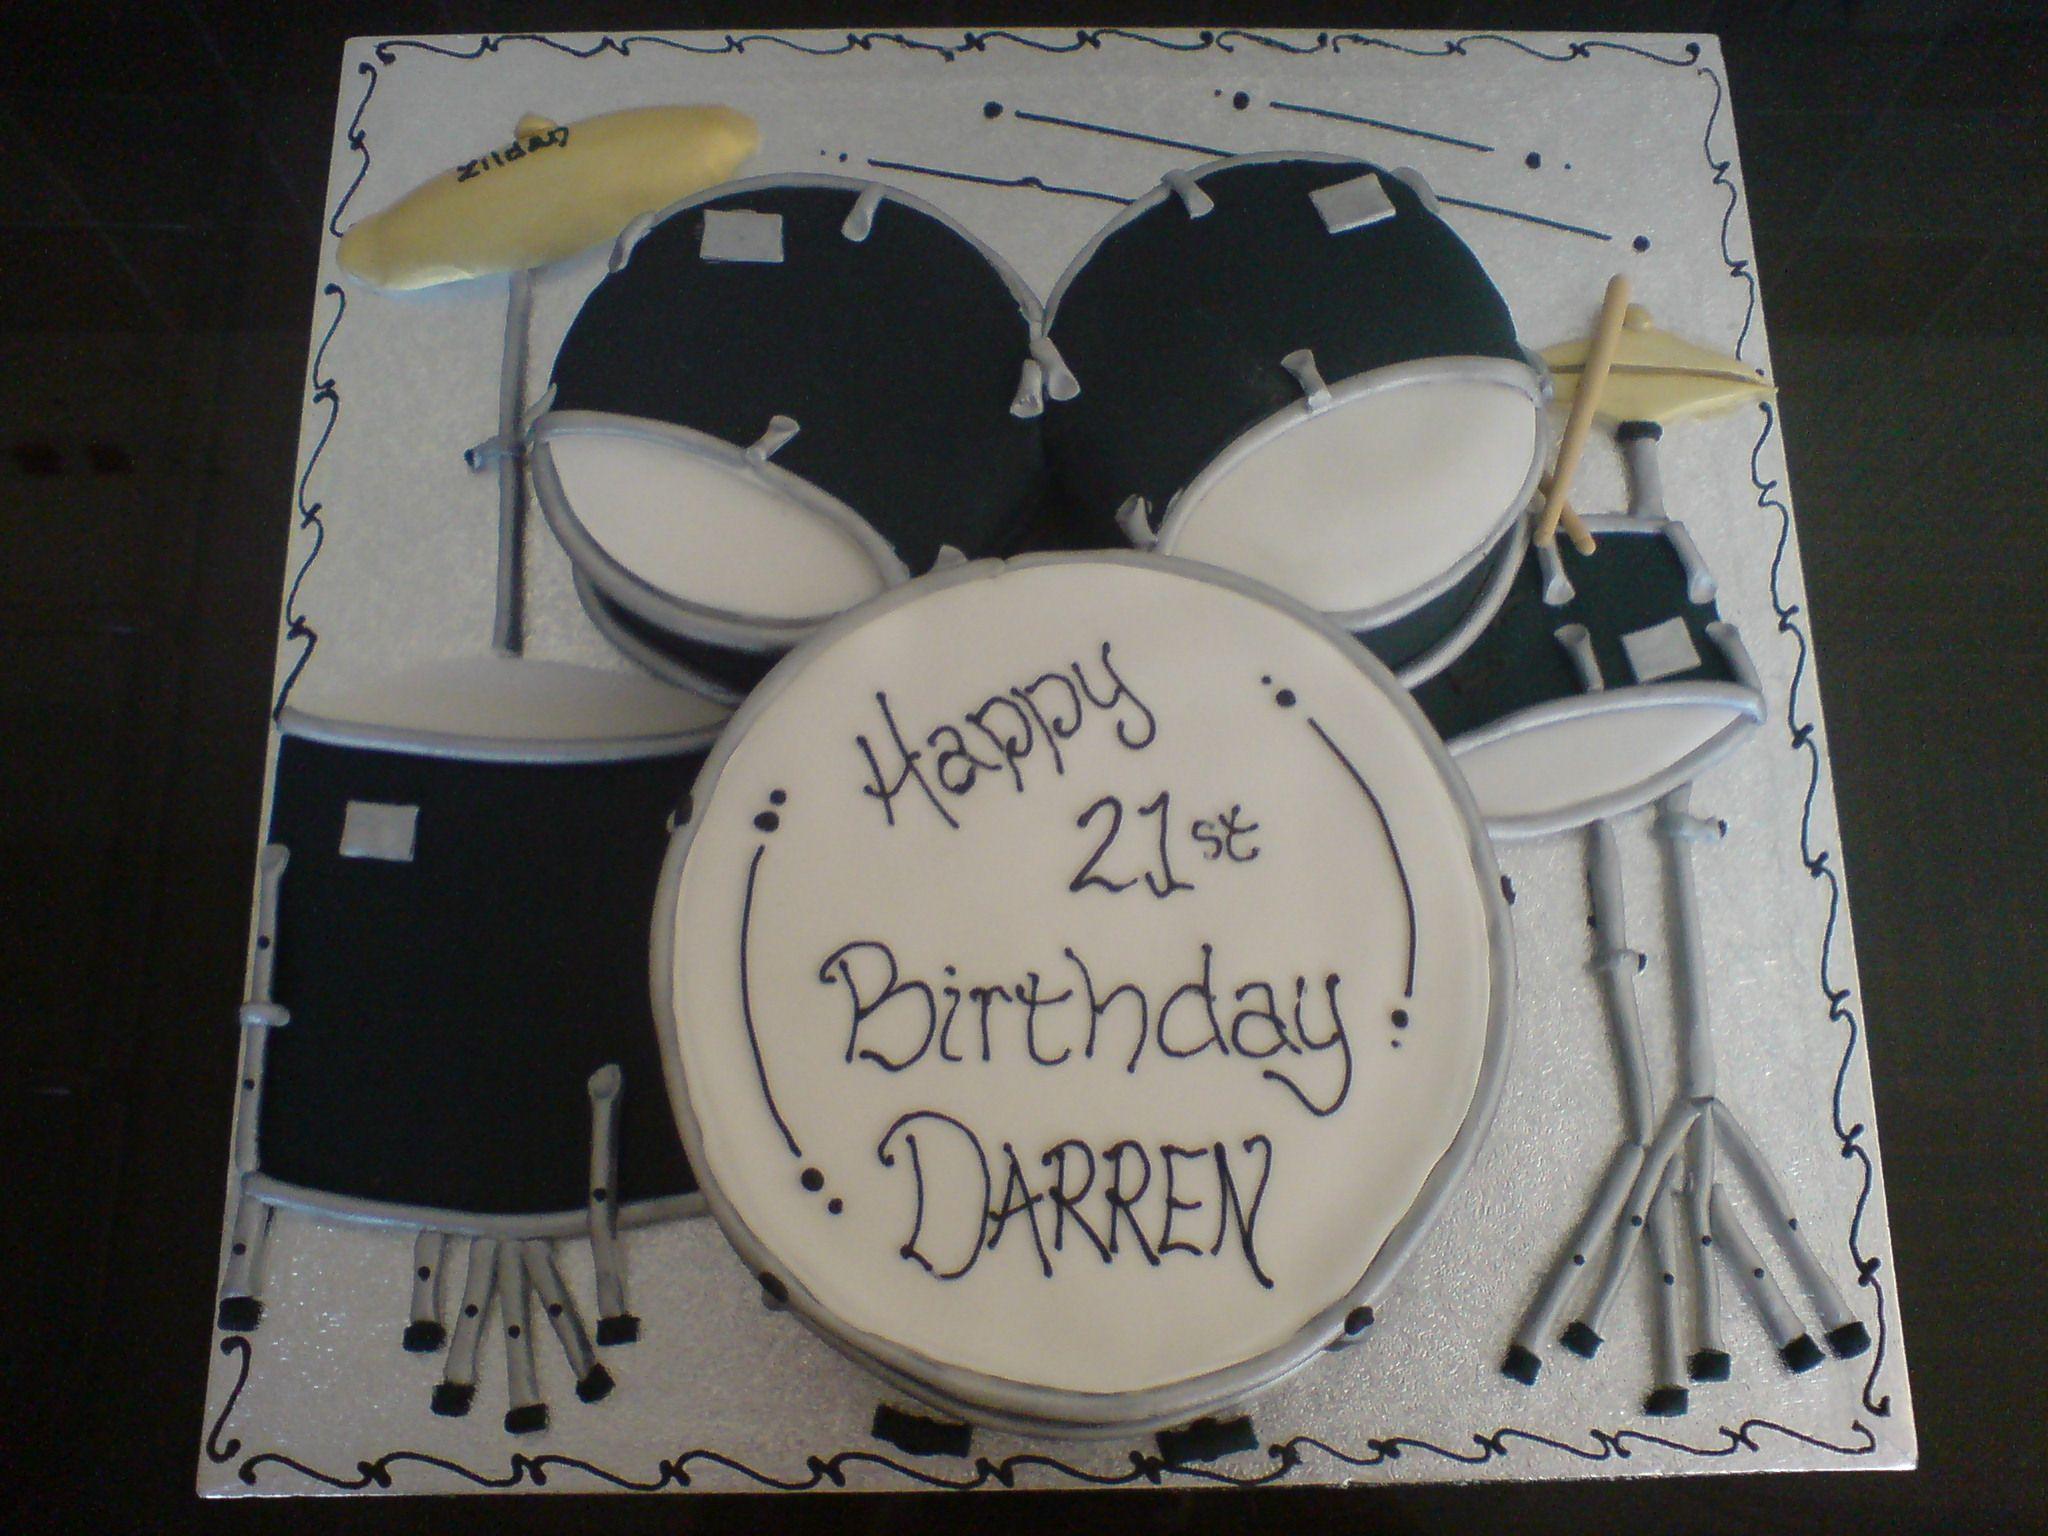 Cake Decorating Drum Kit : Drum kit cake (Bakery ideas) Pinterest